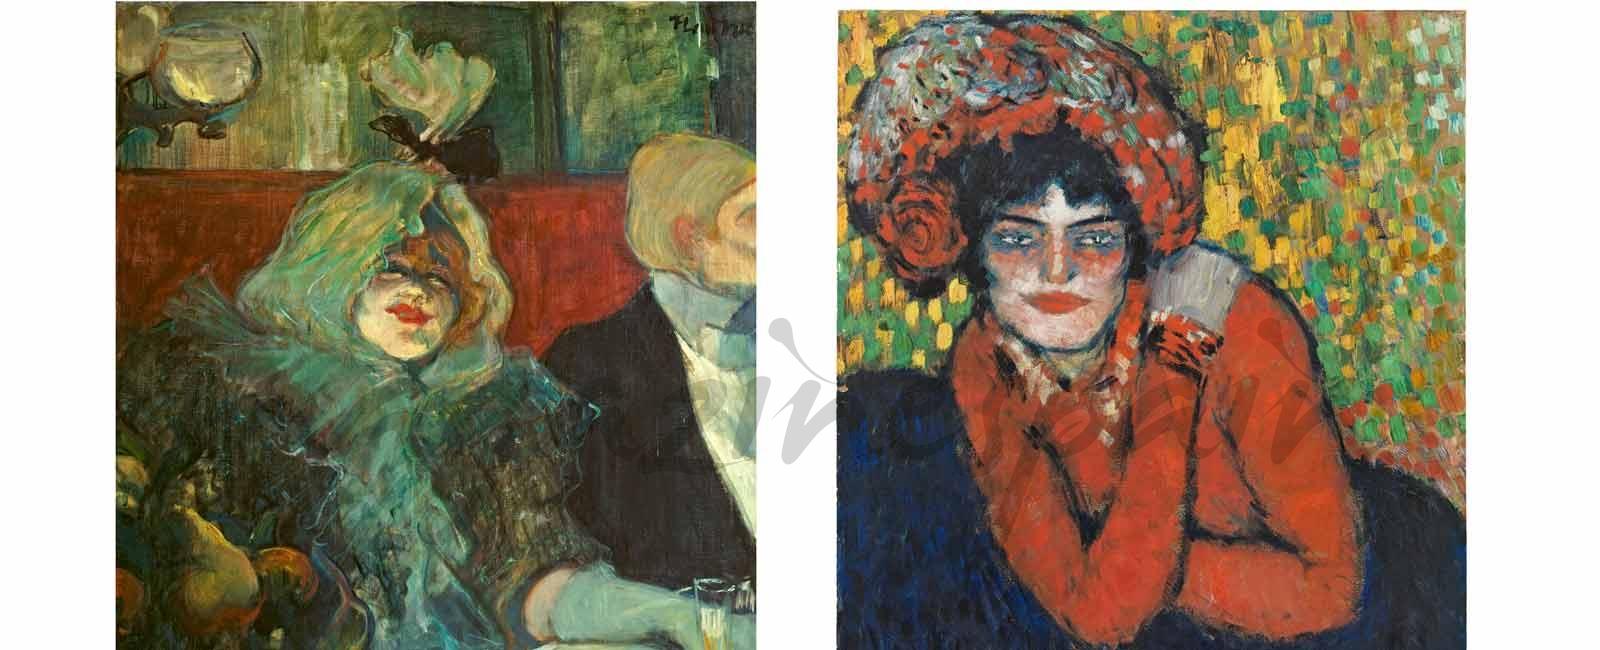 Picasso/Lautrec en el Museo Thyssen-Bornemisza